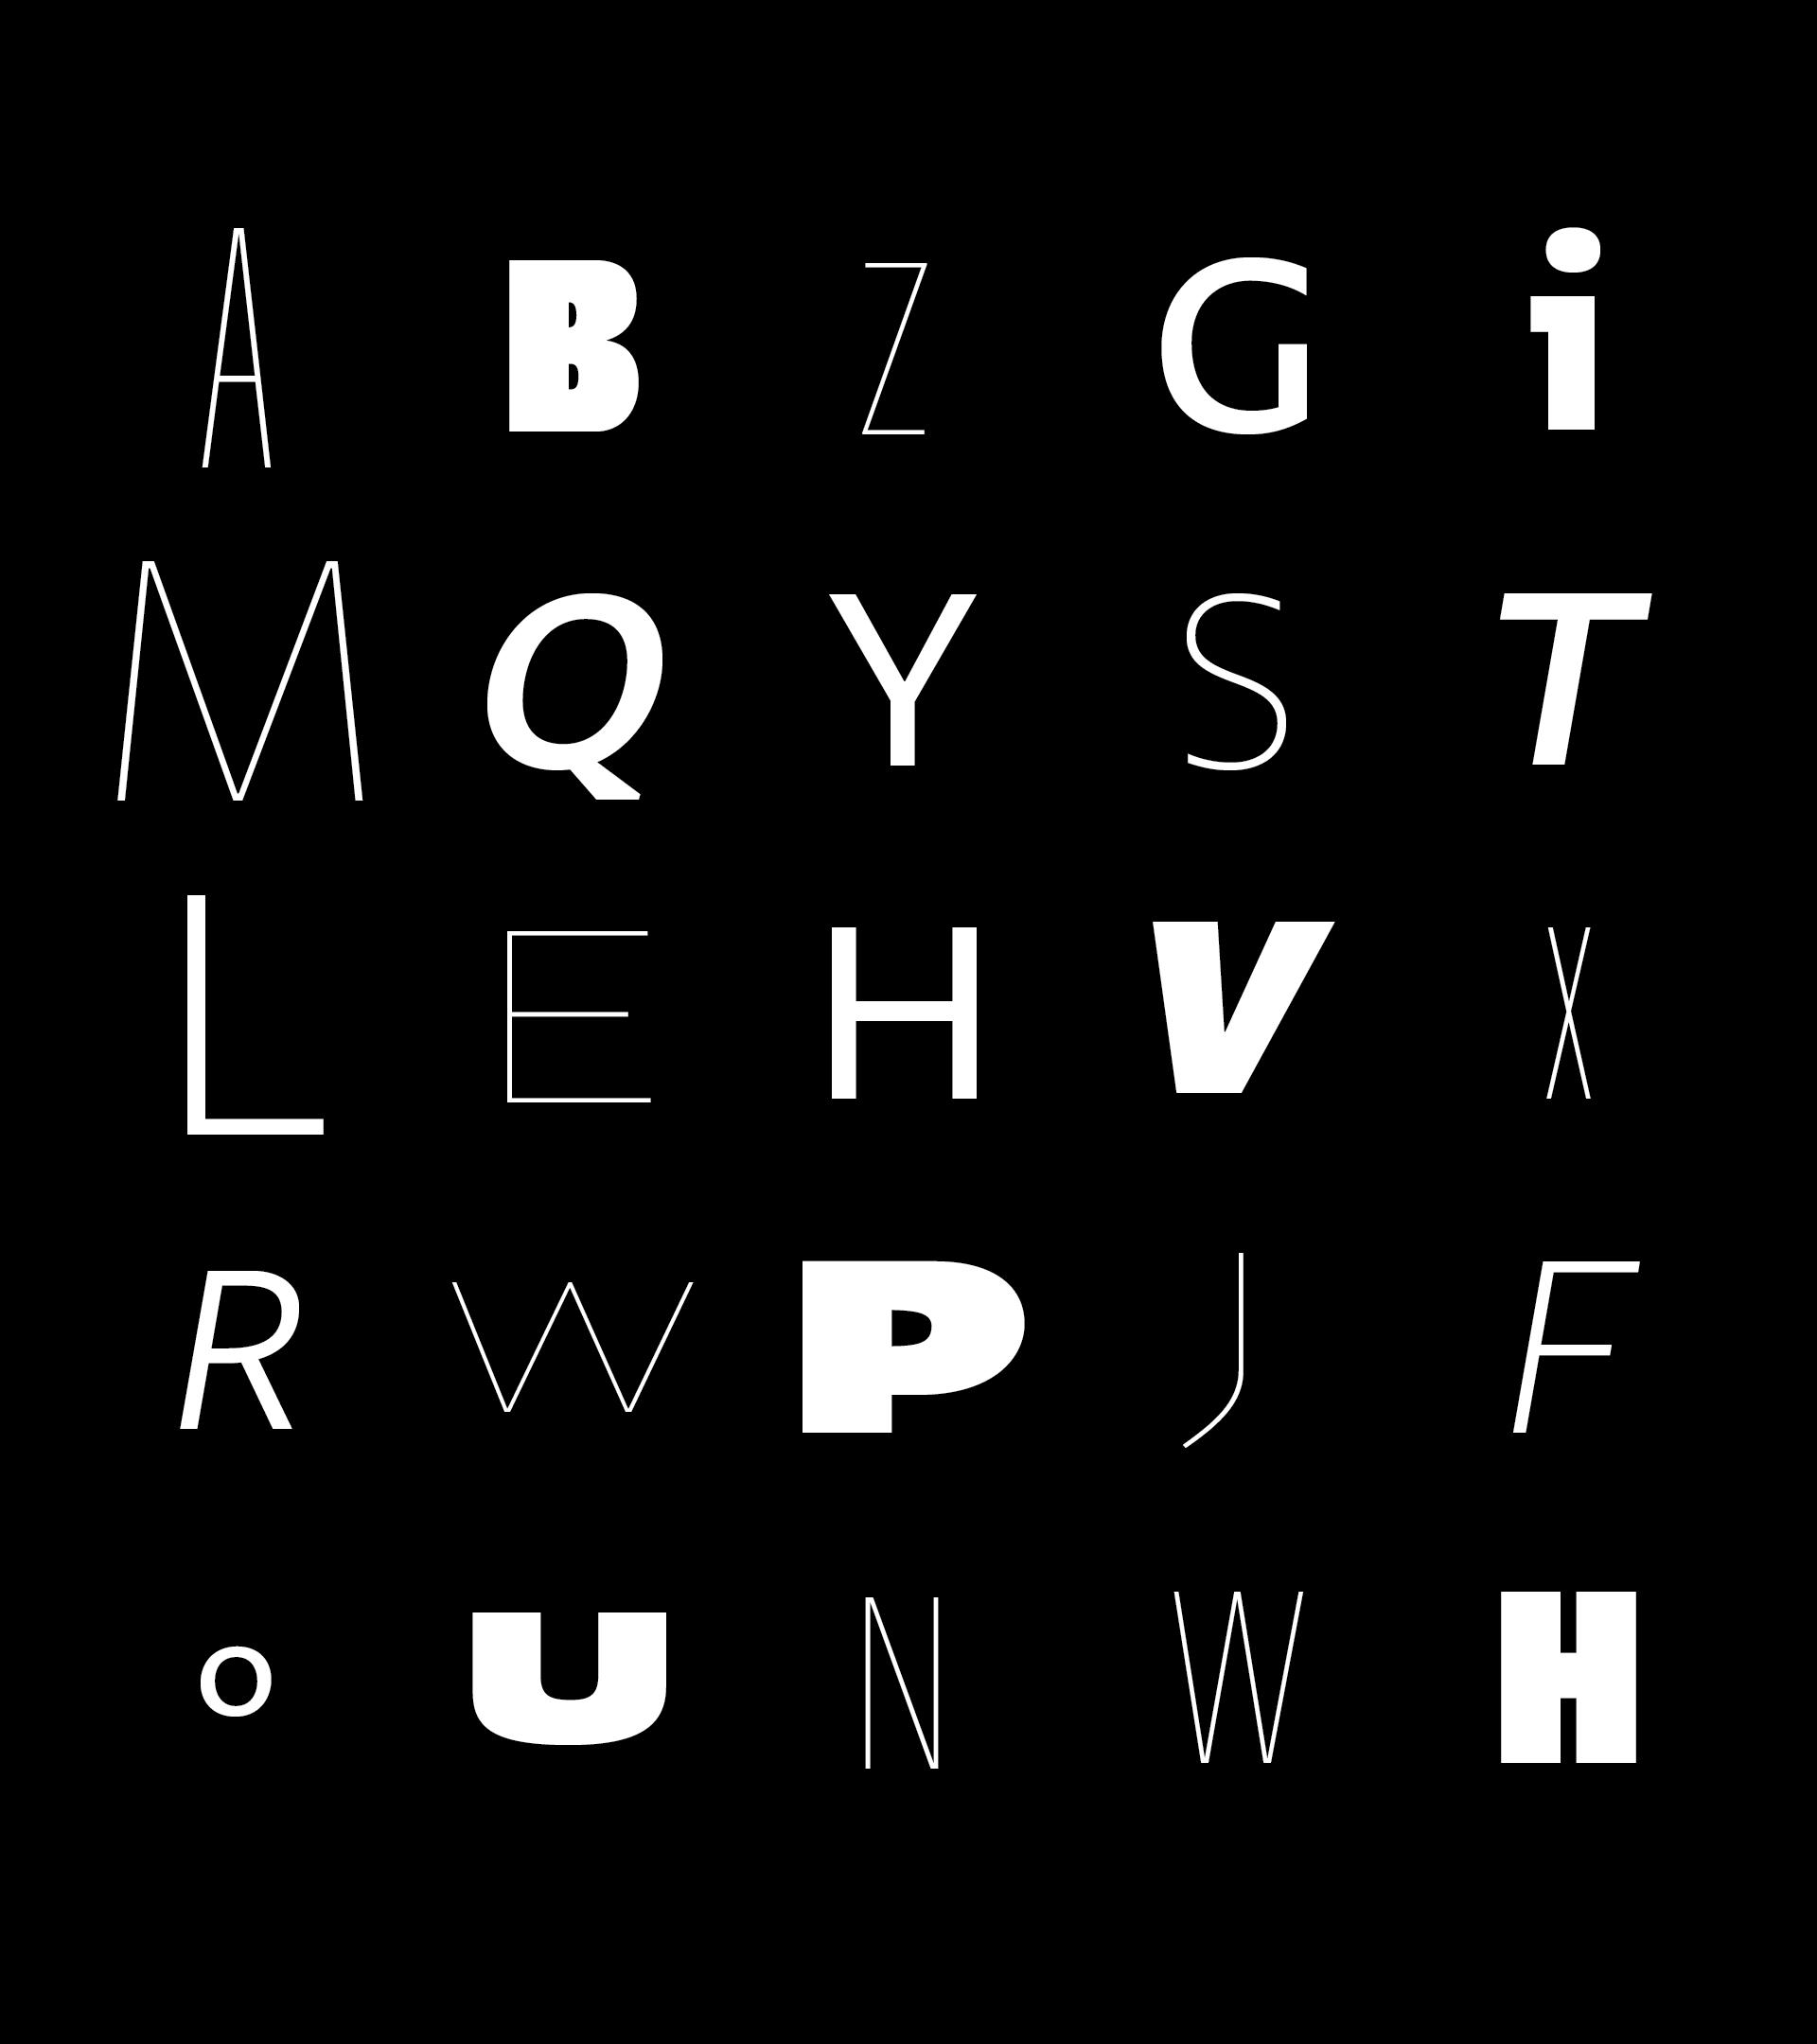 Typo grid_1920x2160